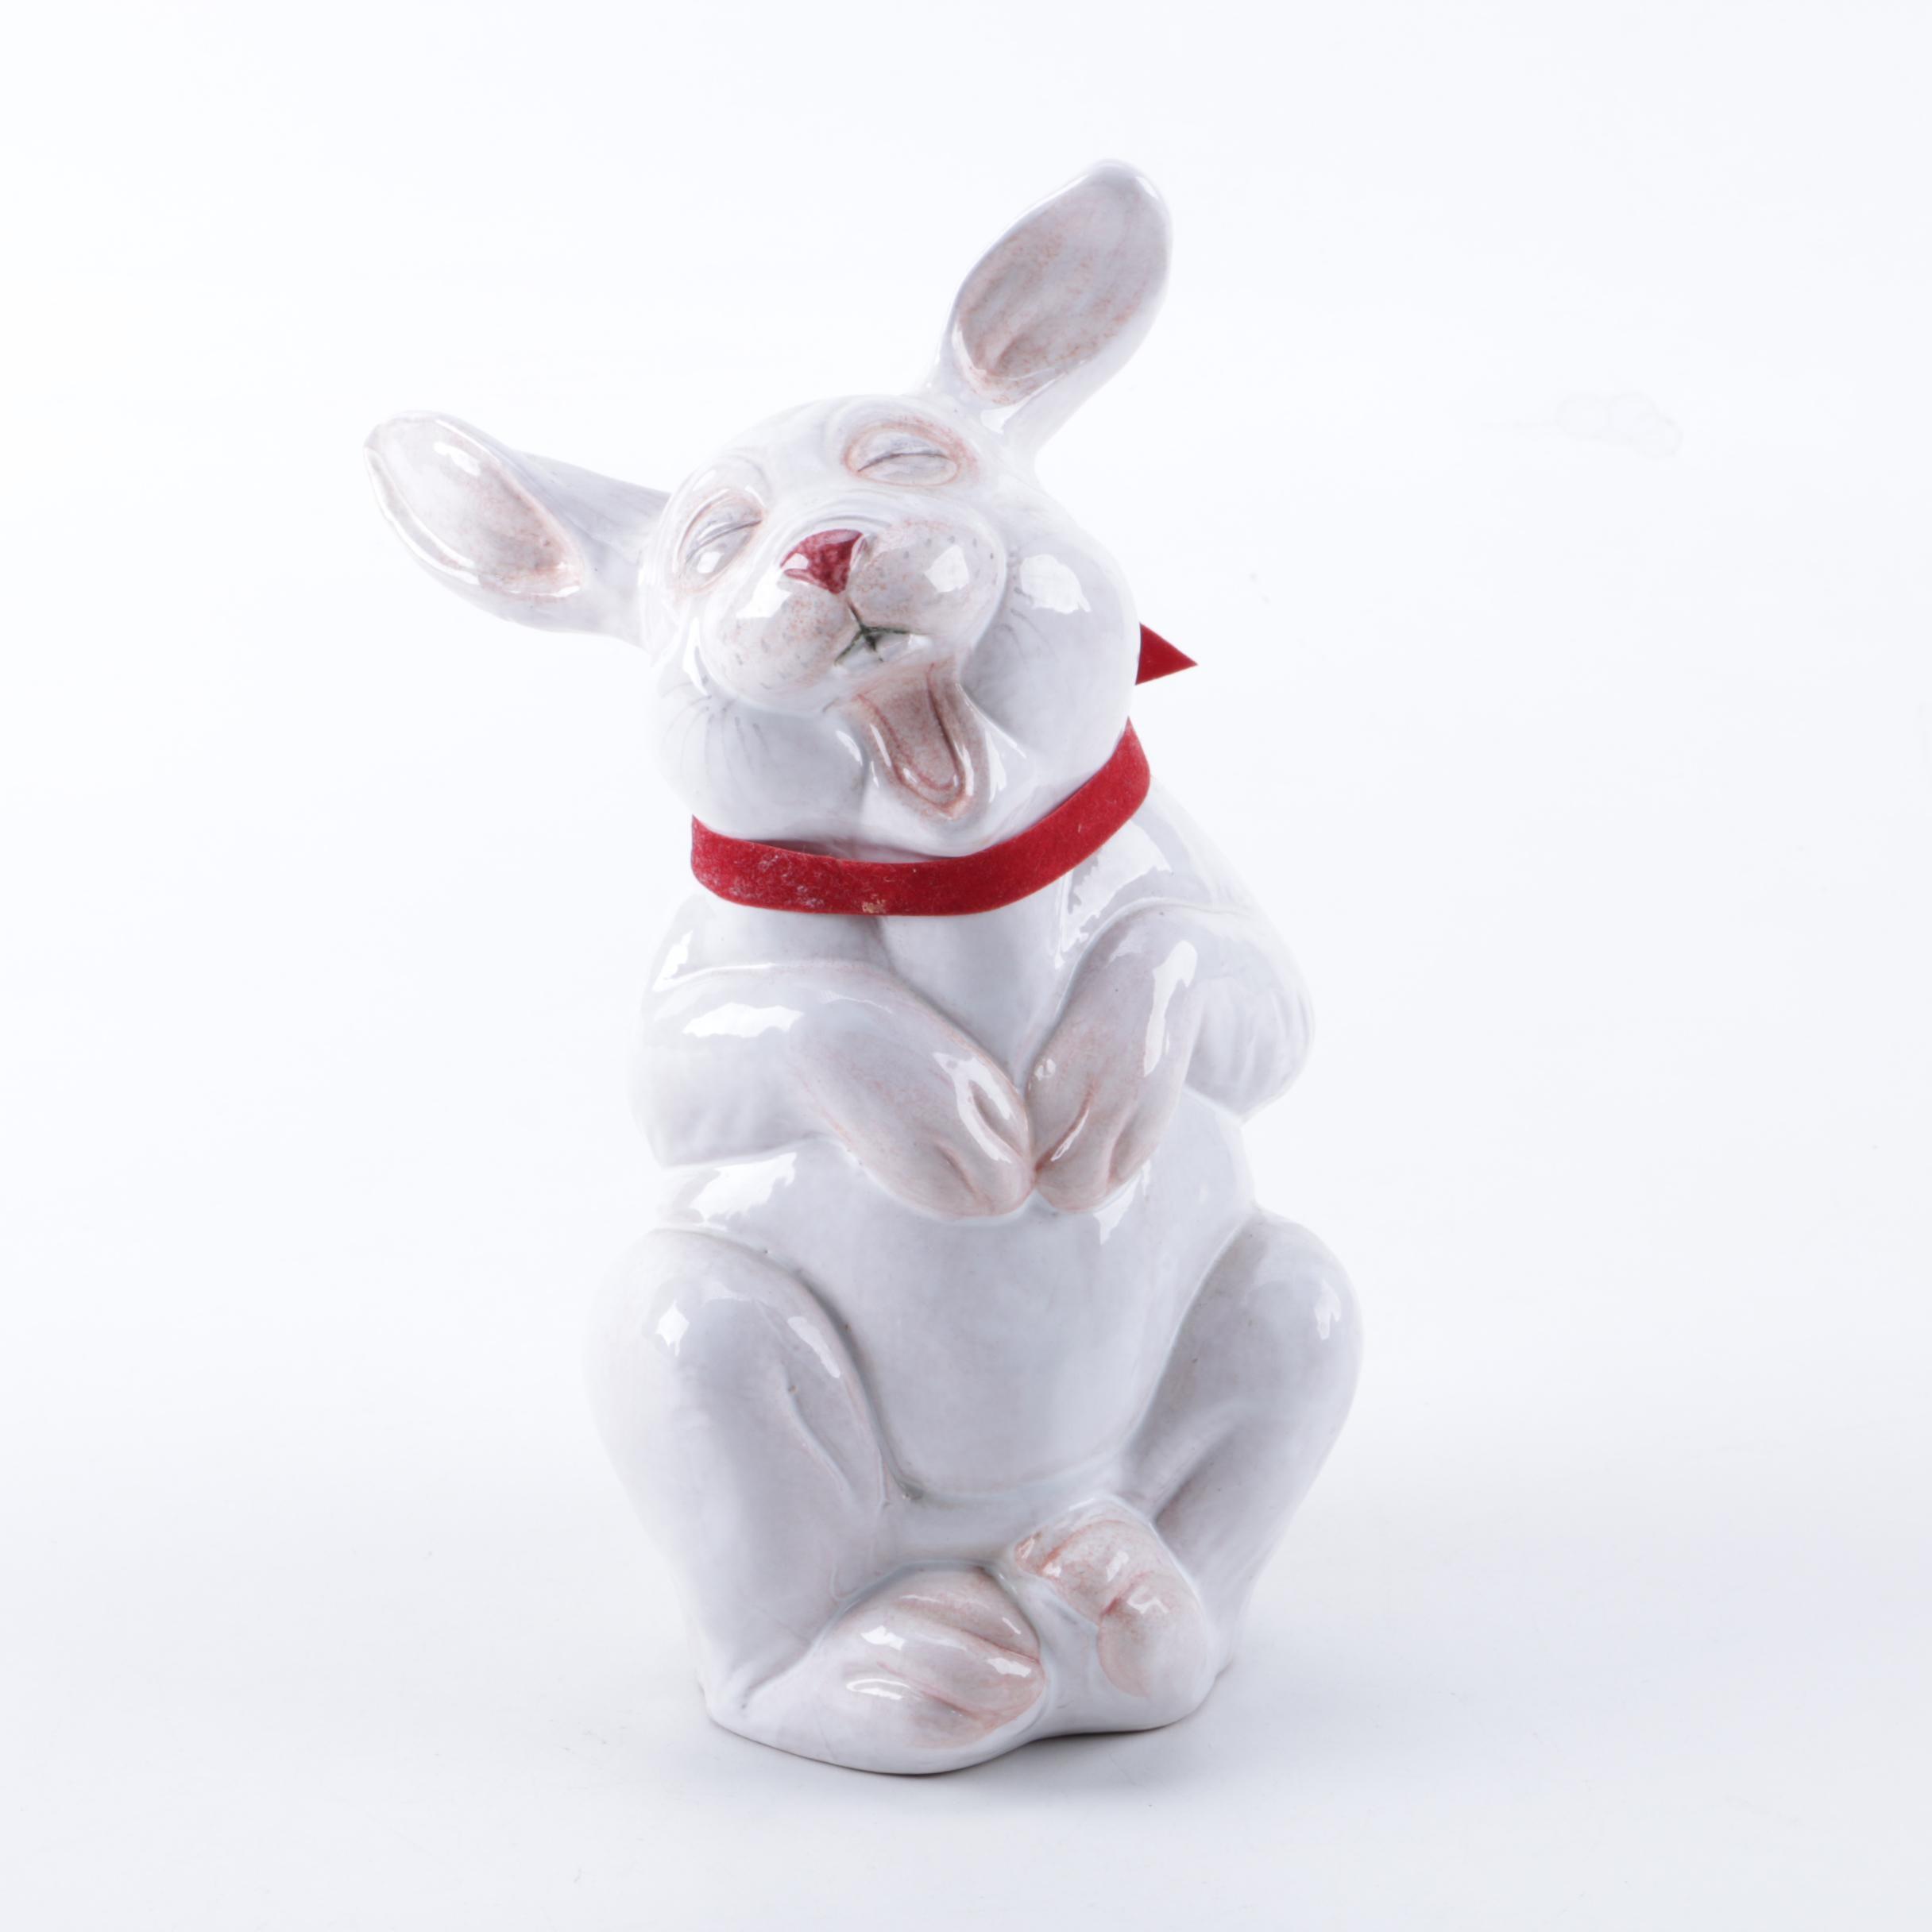 Terracotta Laughing Rabbit Figurine